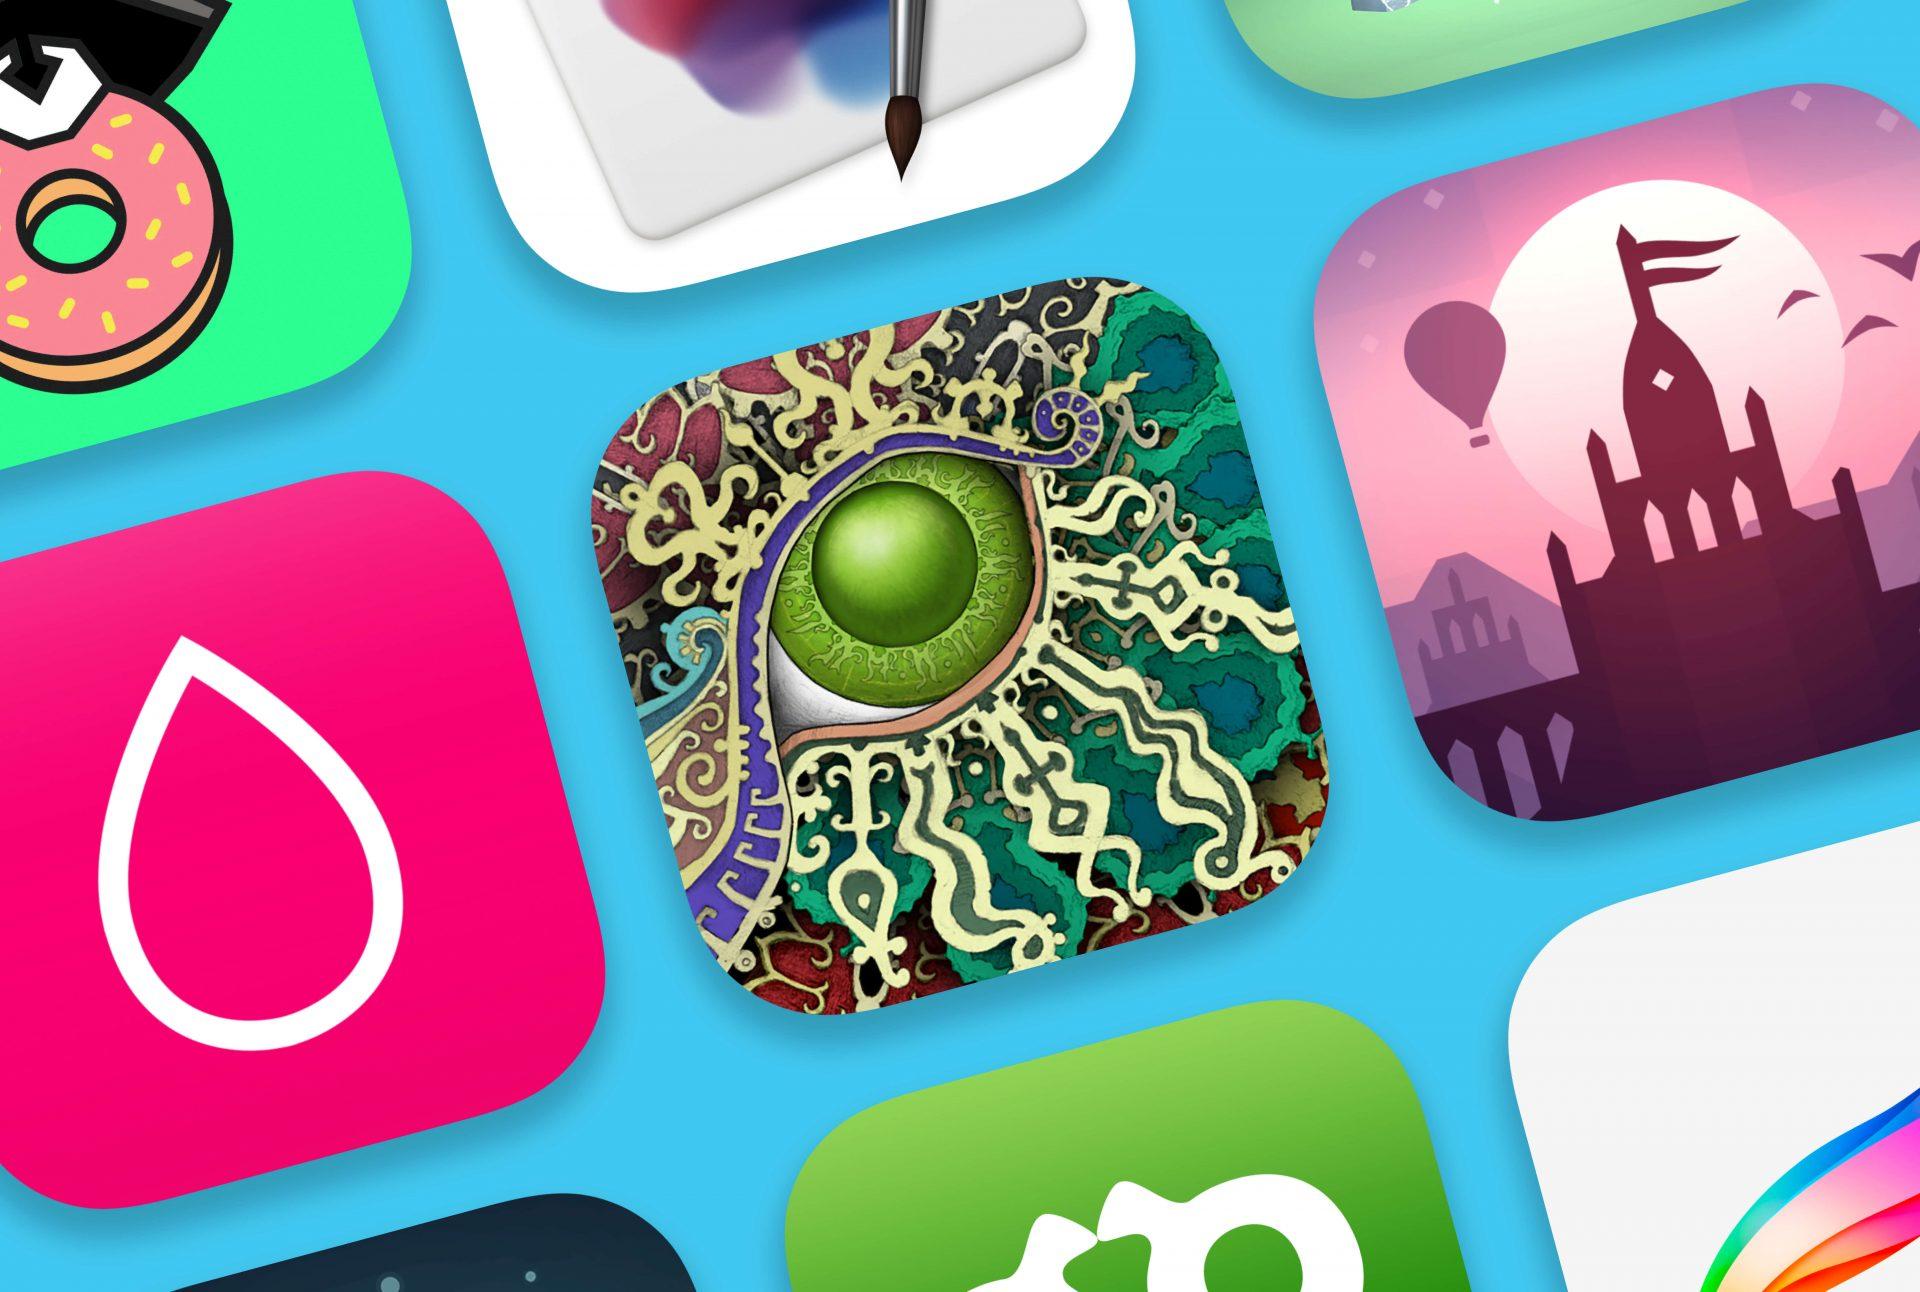 Apple presents best of 2018 Apps 12032018 - Aproveite as promoções de fim de ano da App Store